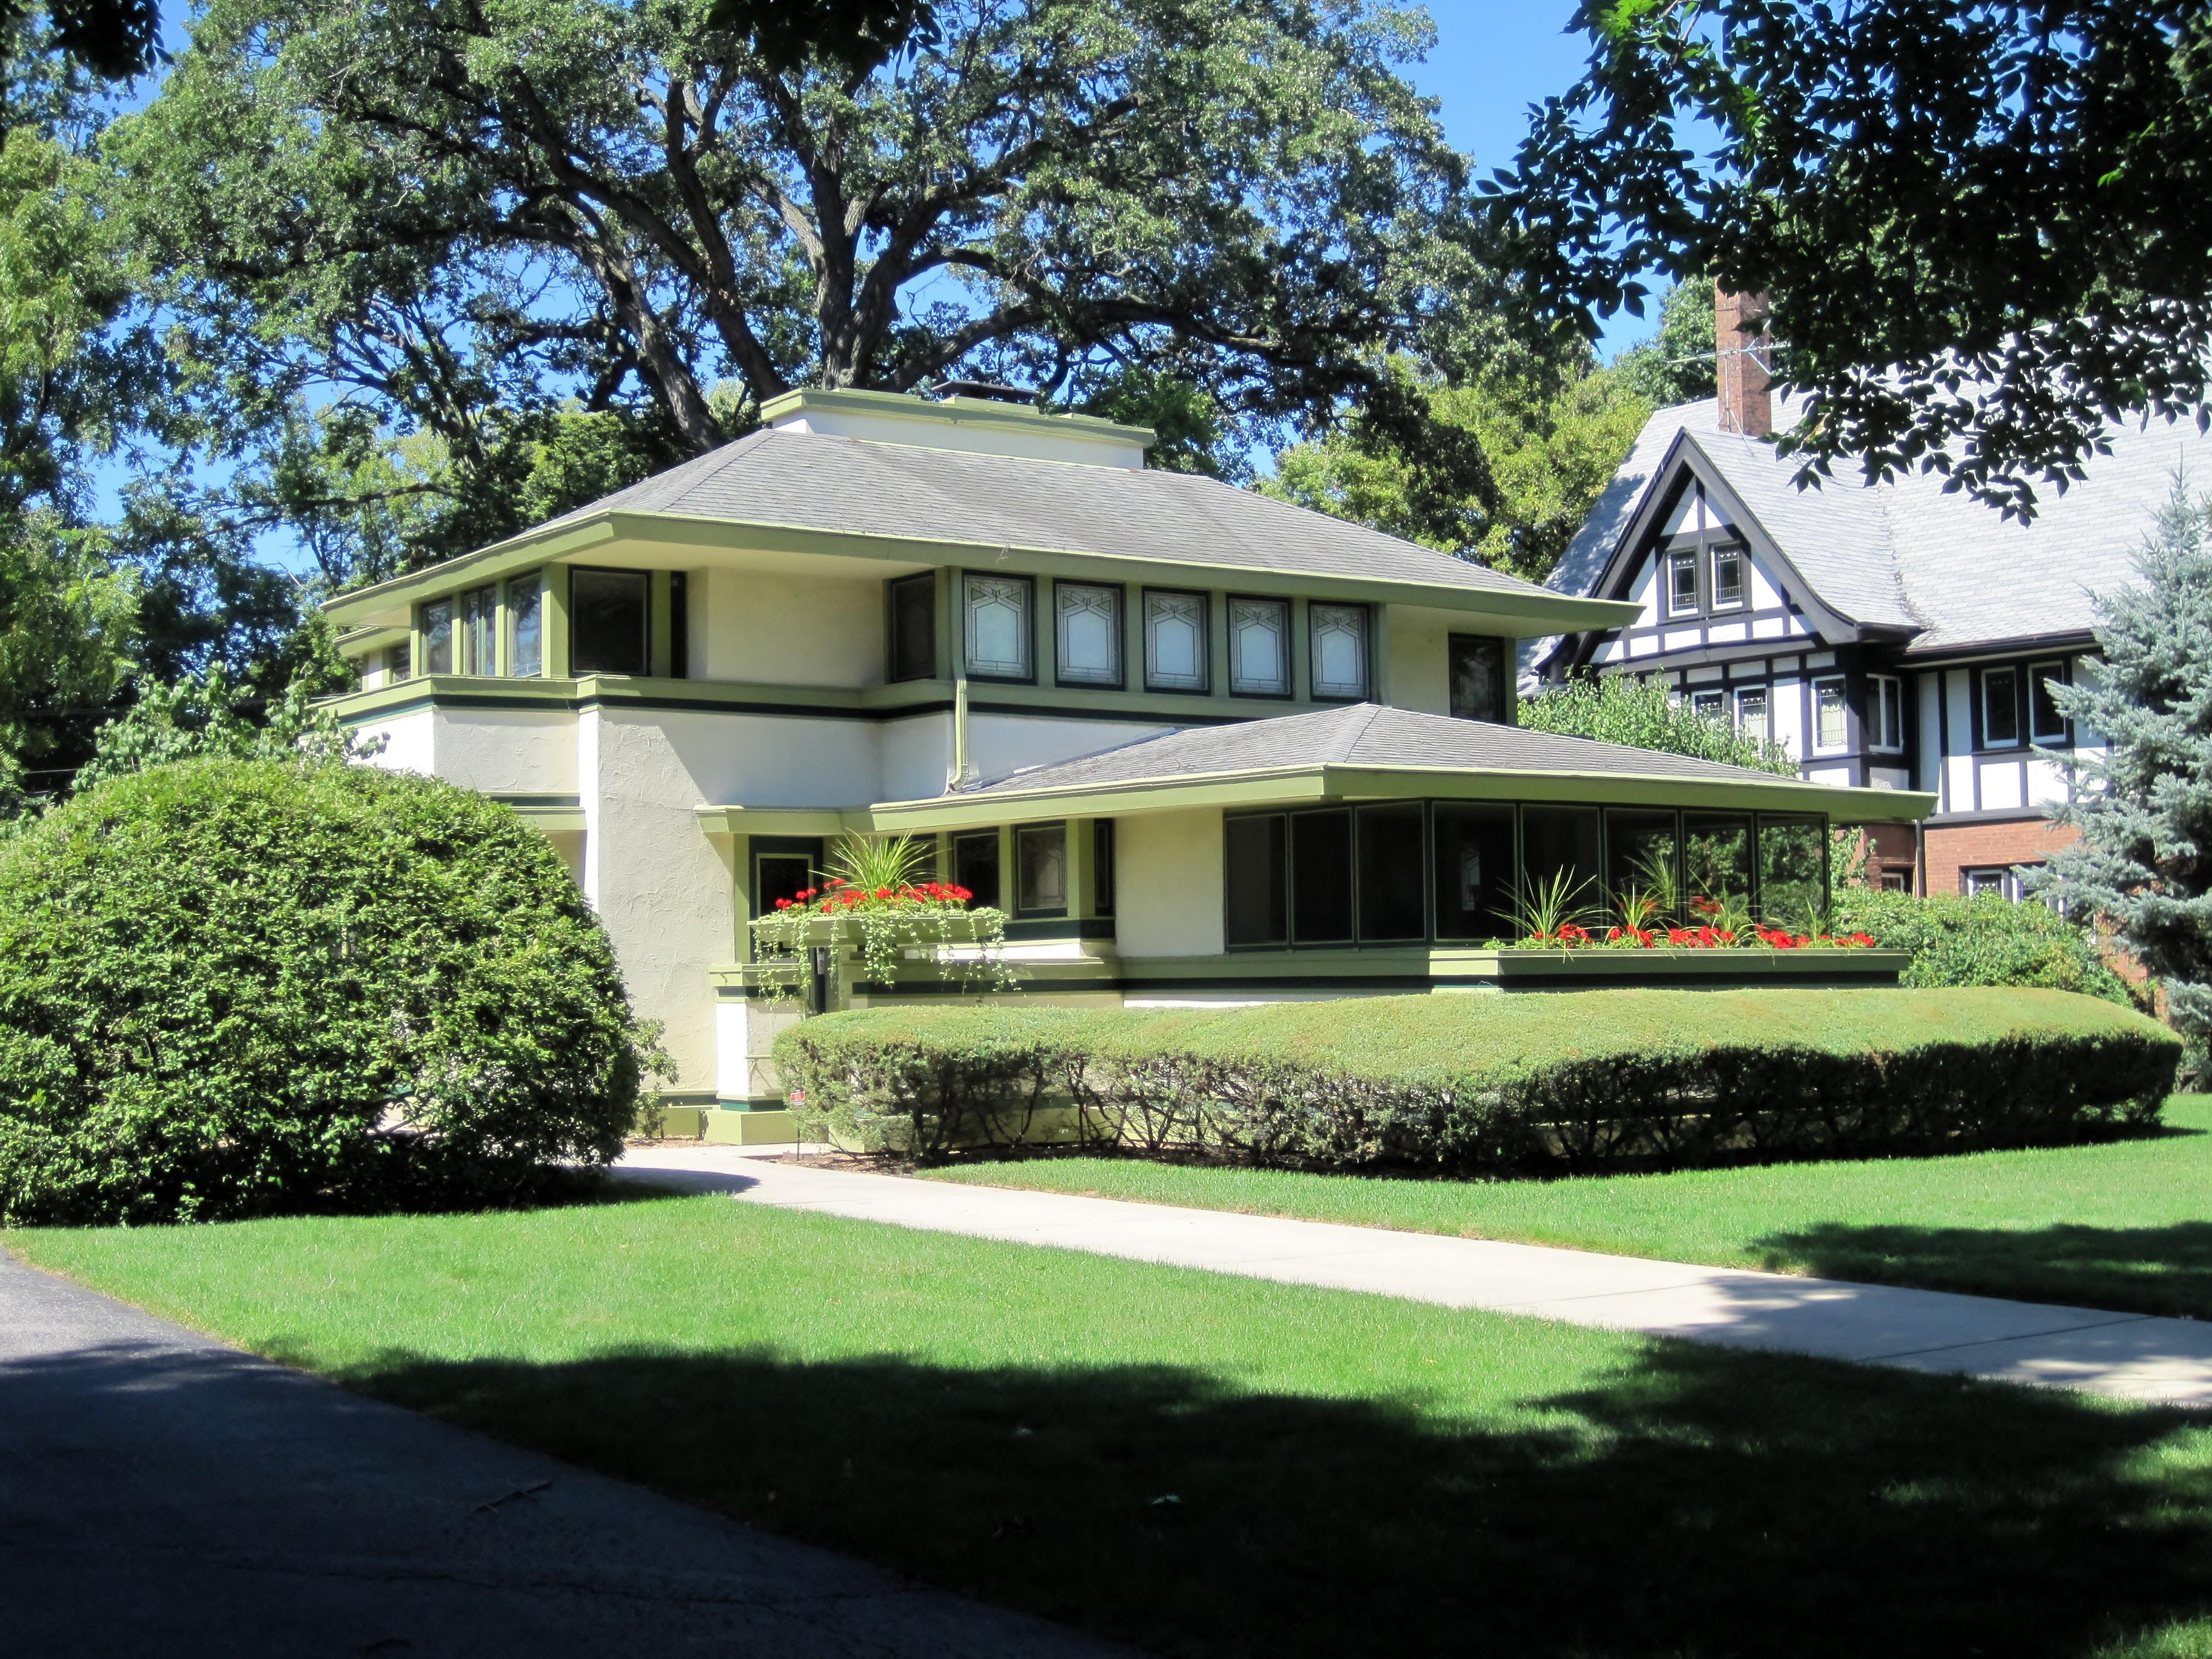 File:J Kibben Ingalls House.JPG - Wikimedia Commons